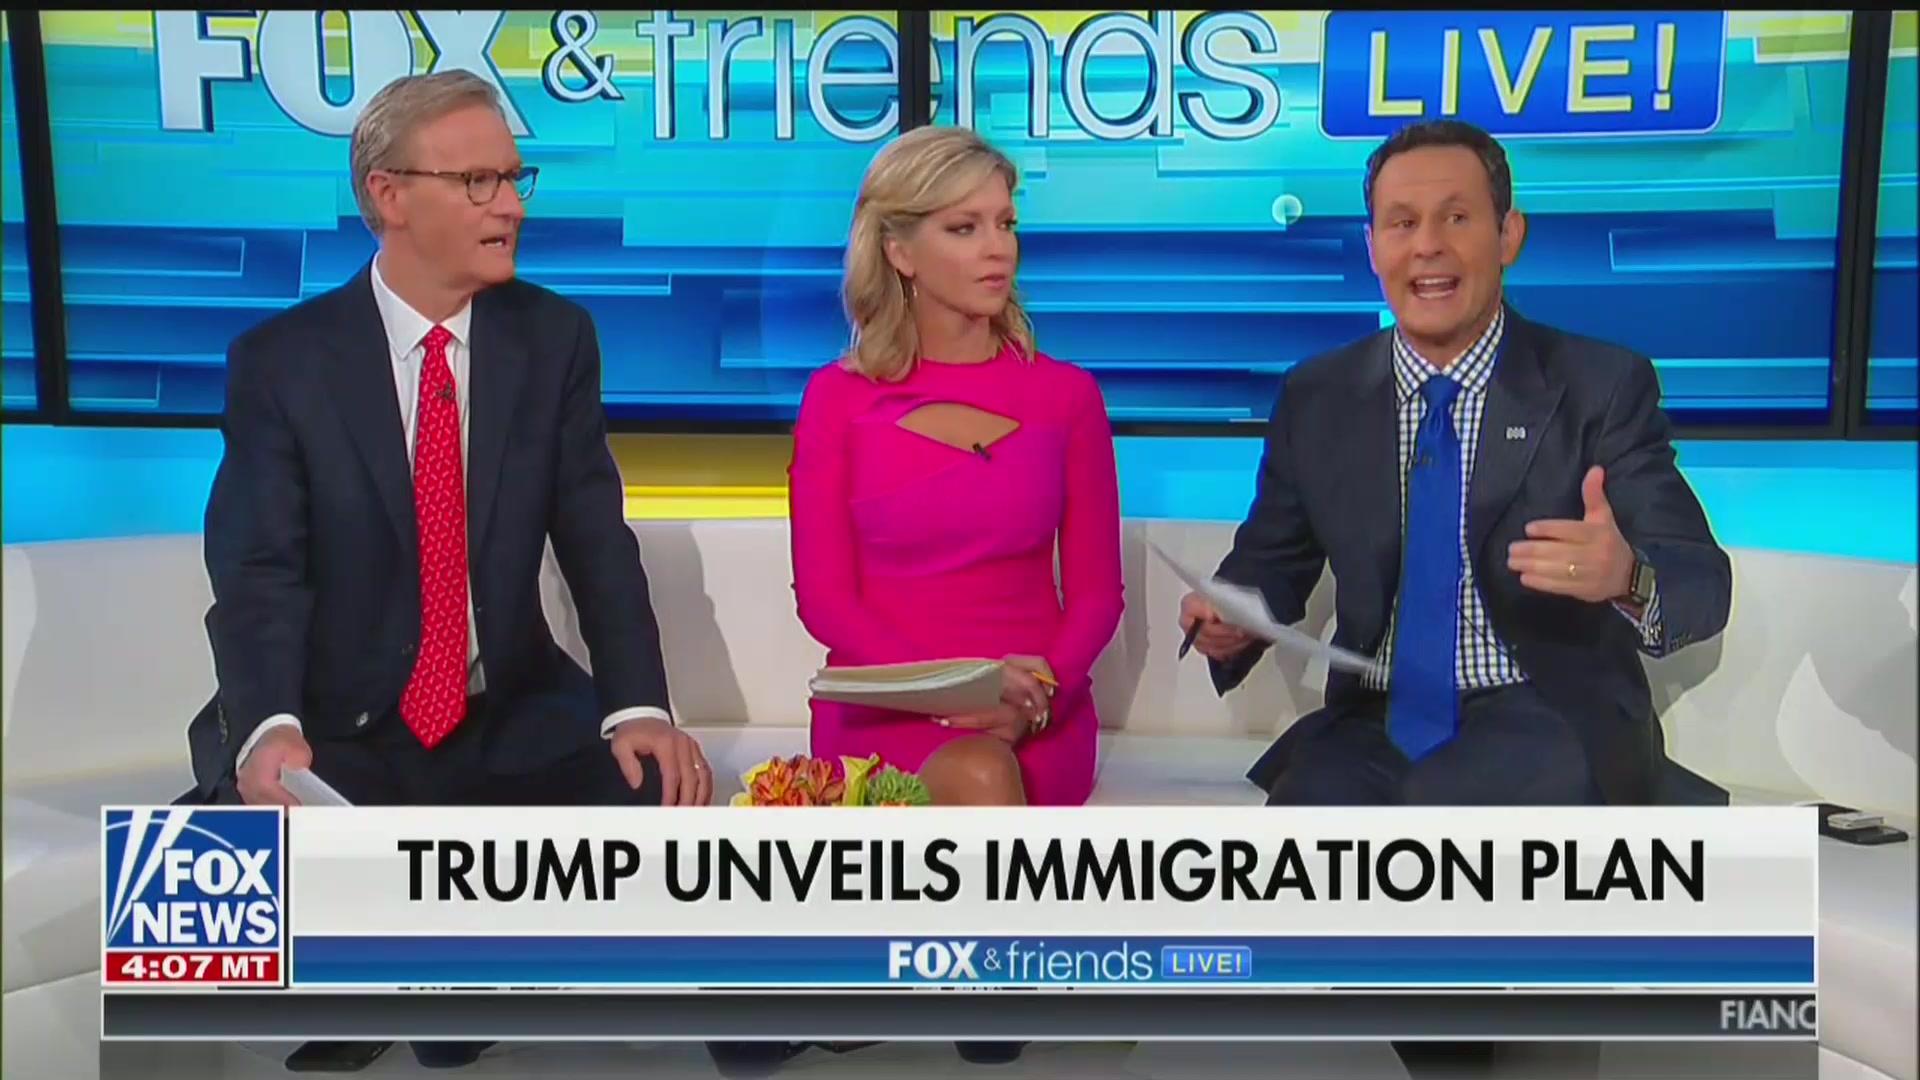 Fox & Friends' Brian Kilmeade: Crisis at Border Is 'Almost Like' 9/11